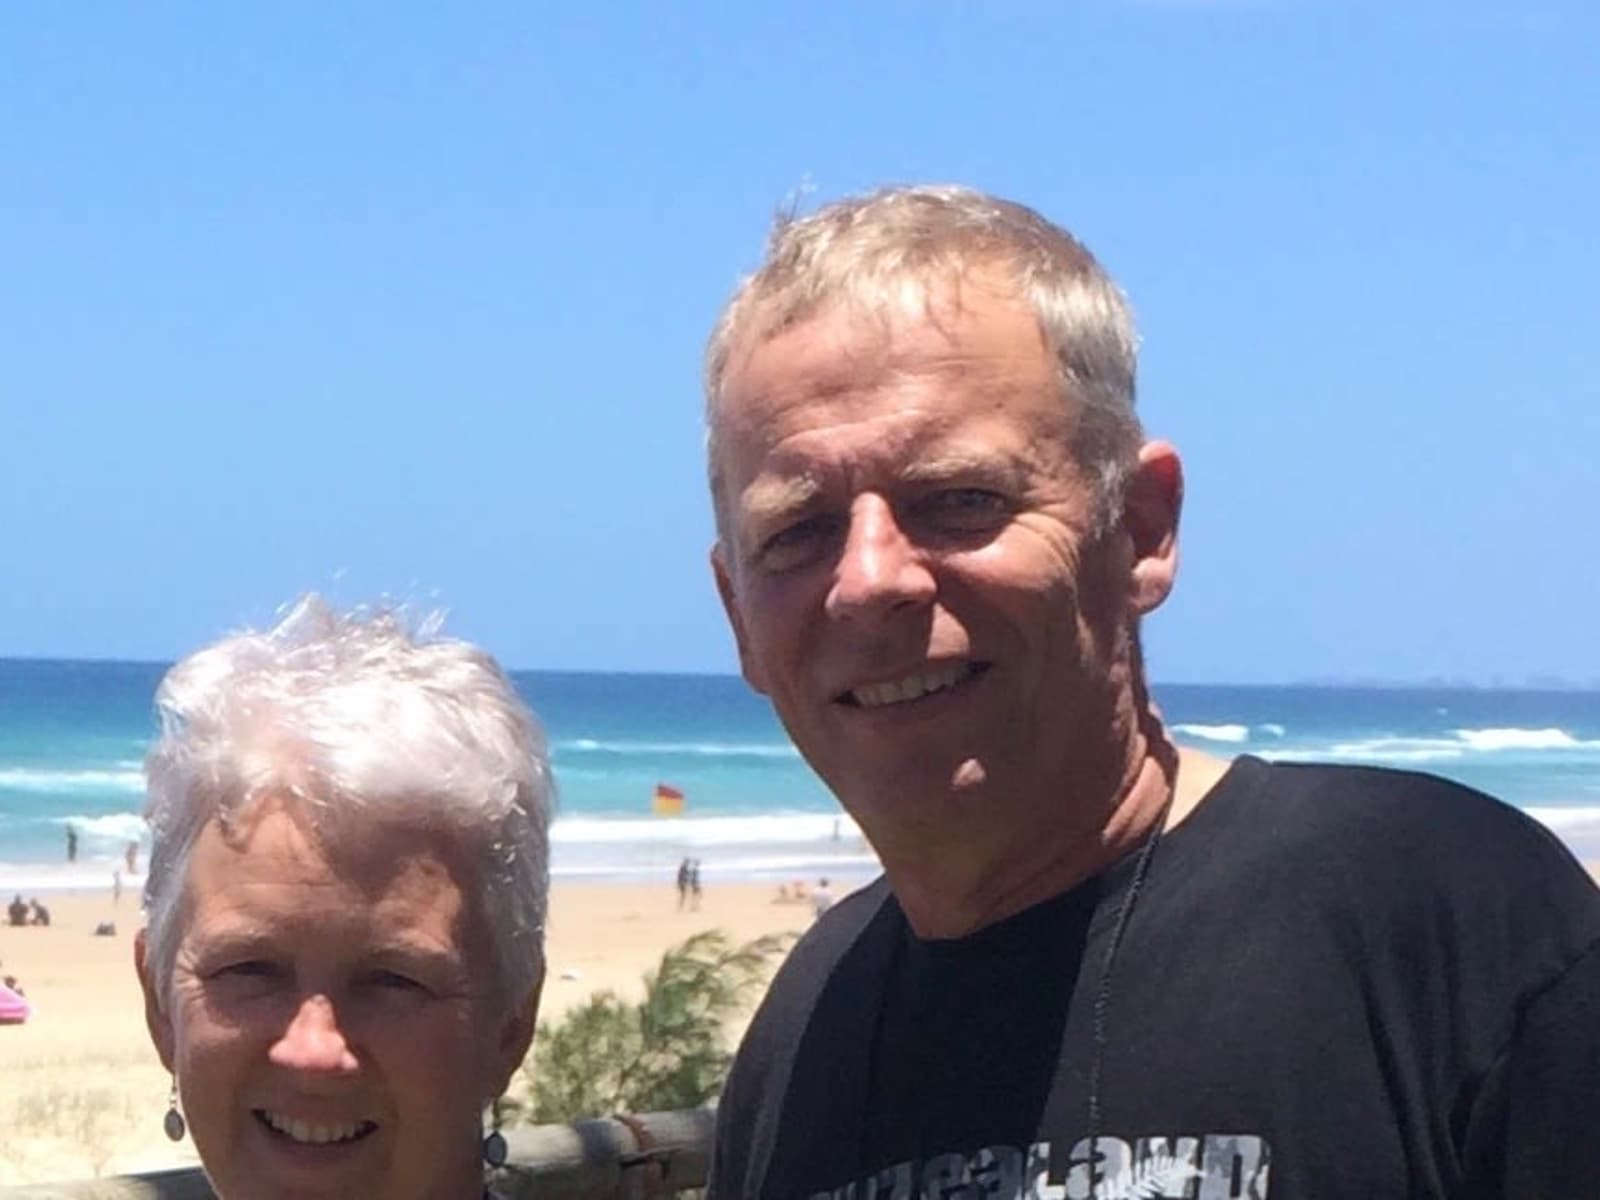 Jude & Grant from Invercargill, New Zealand